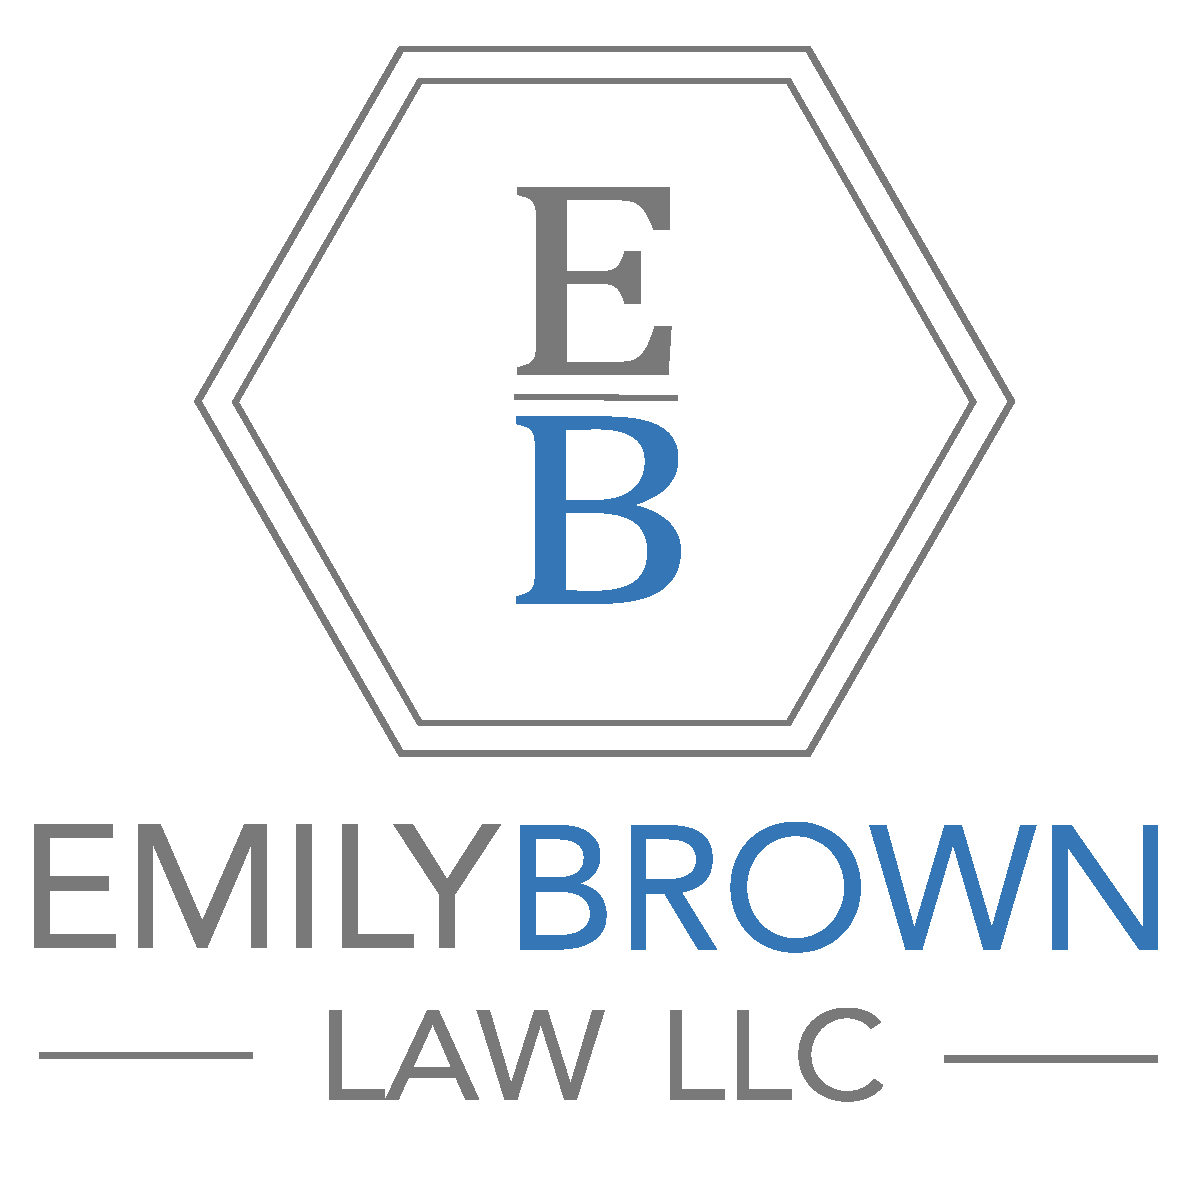 Emily Brown Law LLC